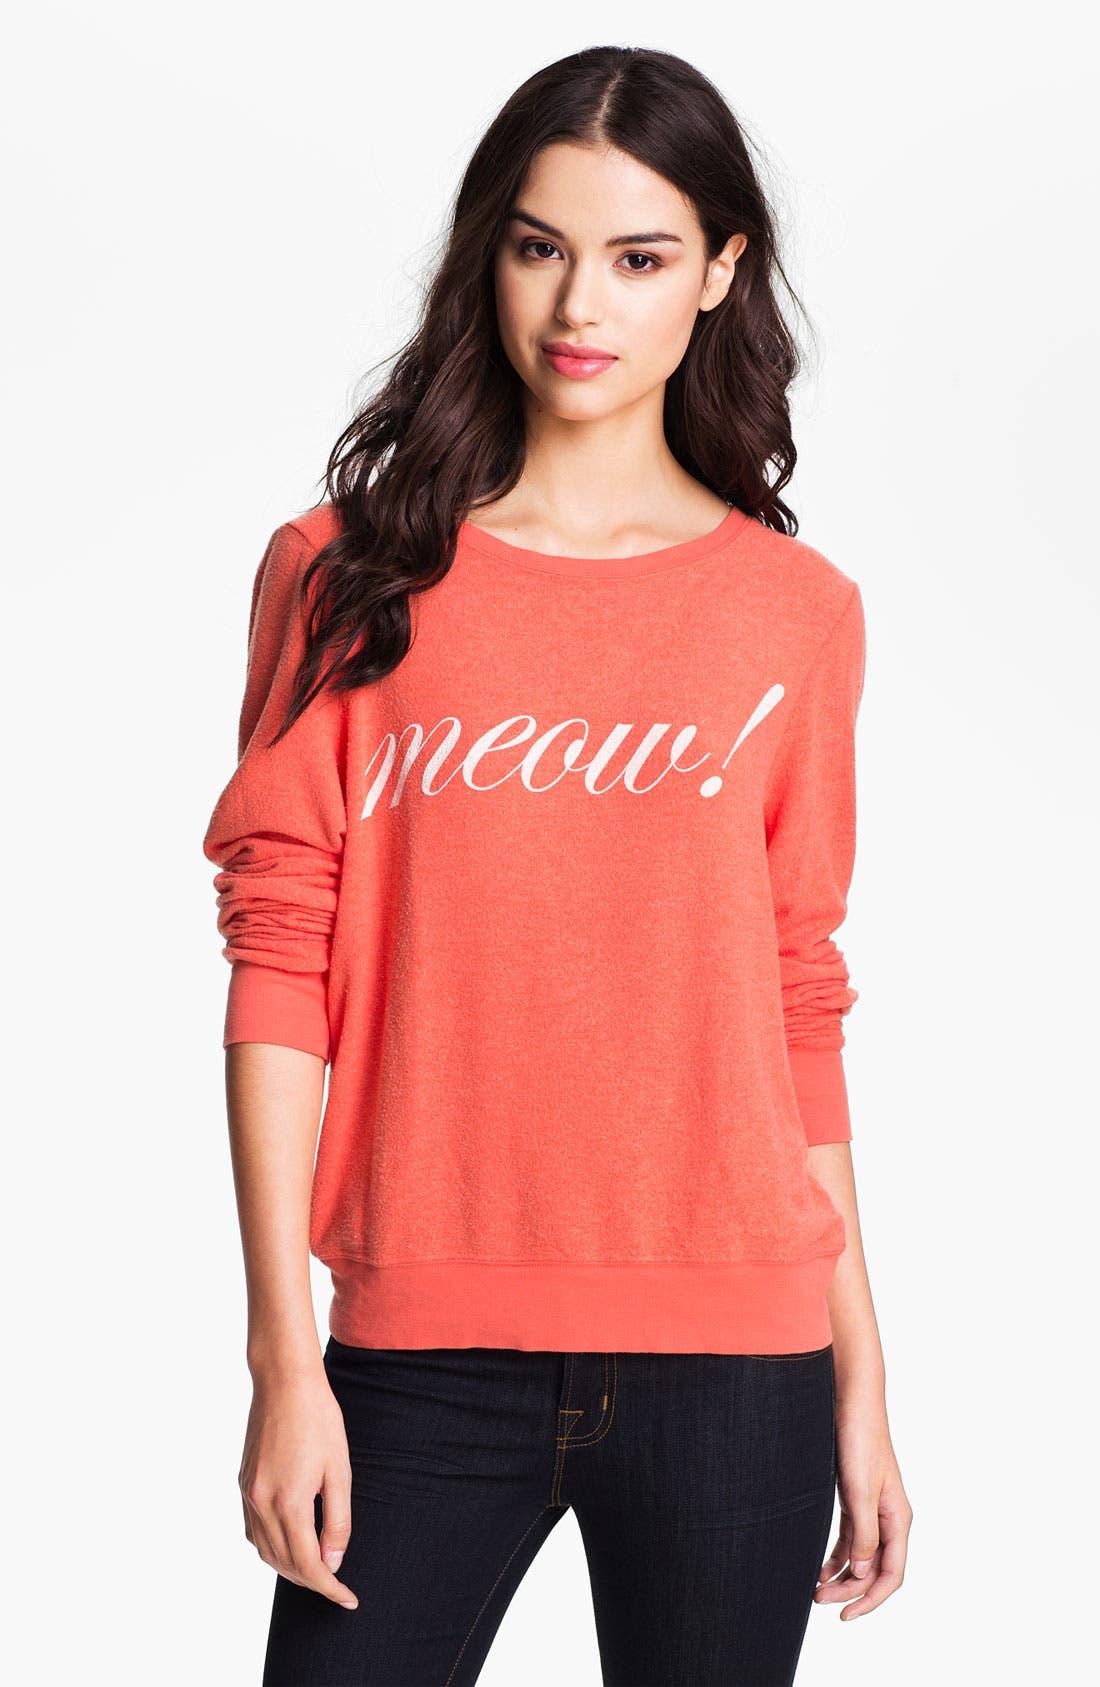 Main Image - Wildfox 'Meow!' Graphic Sweatshirt